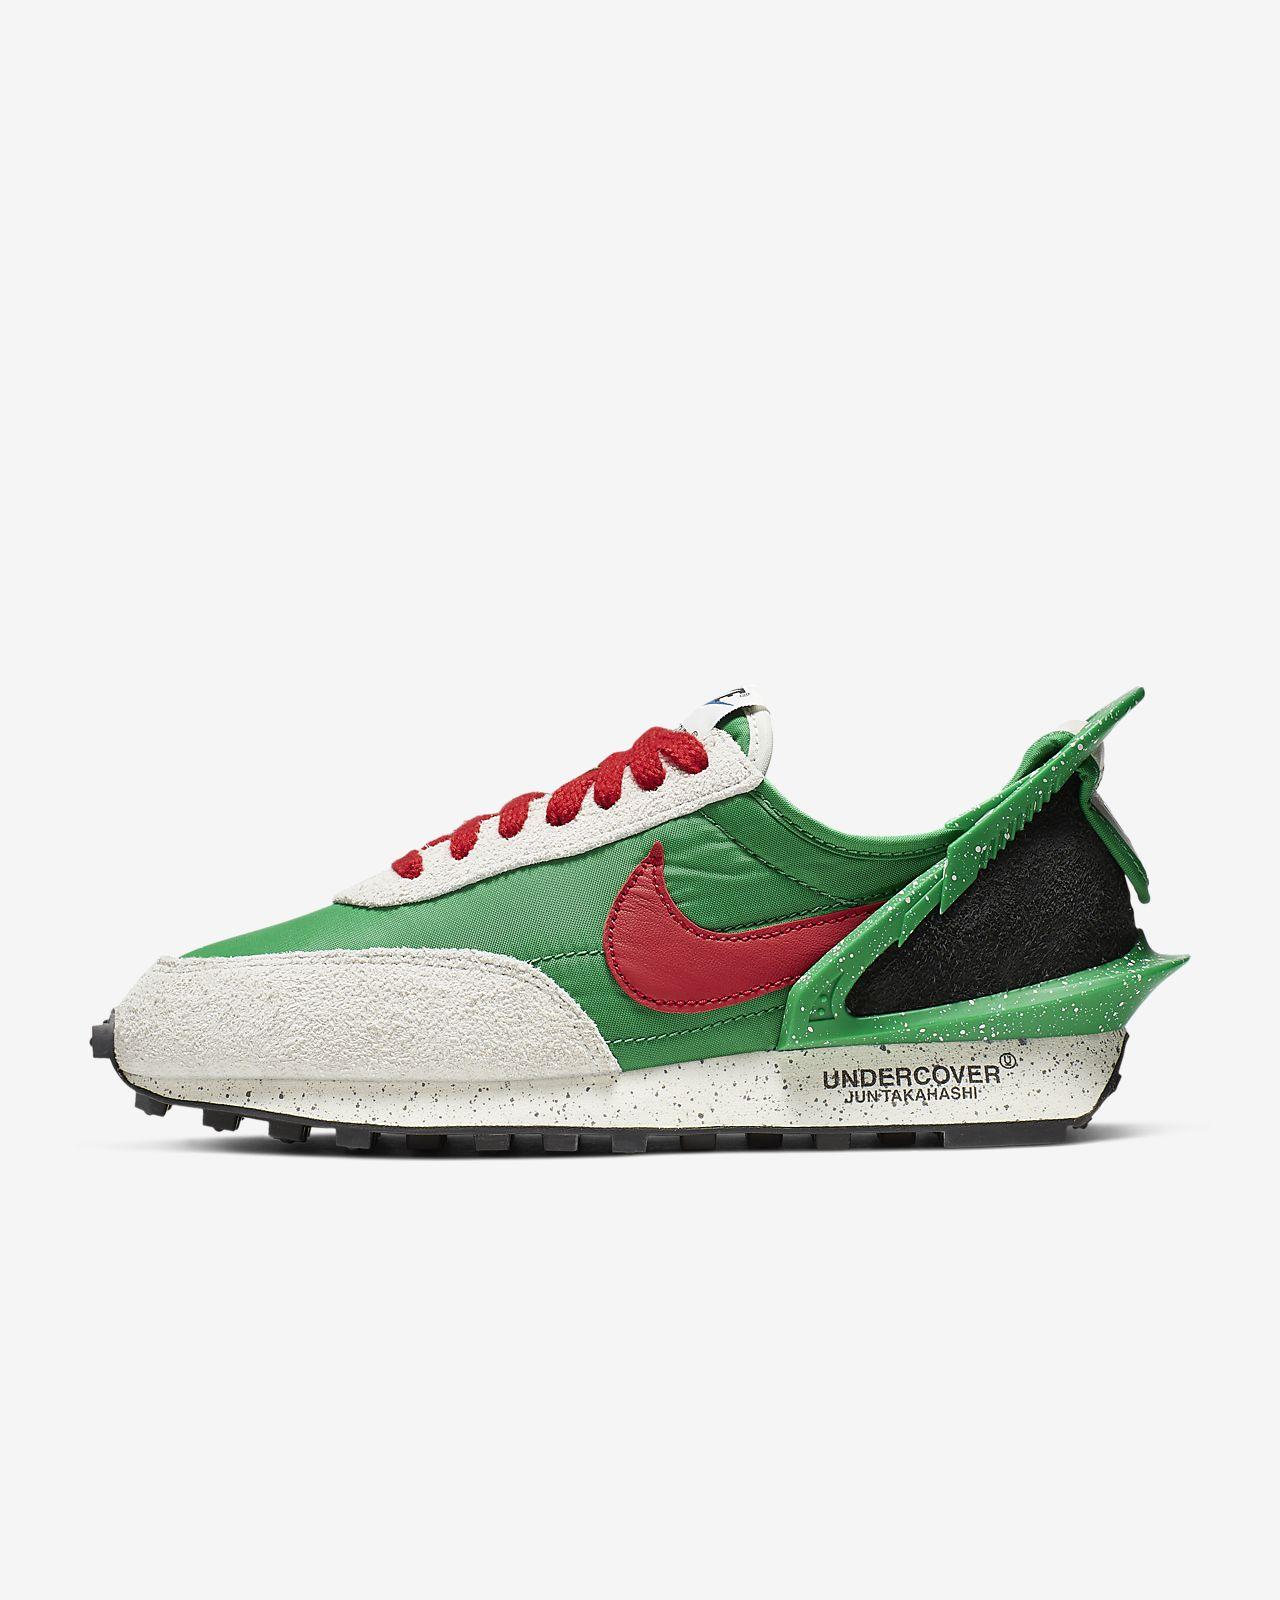 check-out e56b2 58ff5 Nike x Undercover Daybreak Women's Shoe